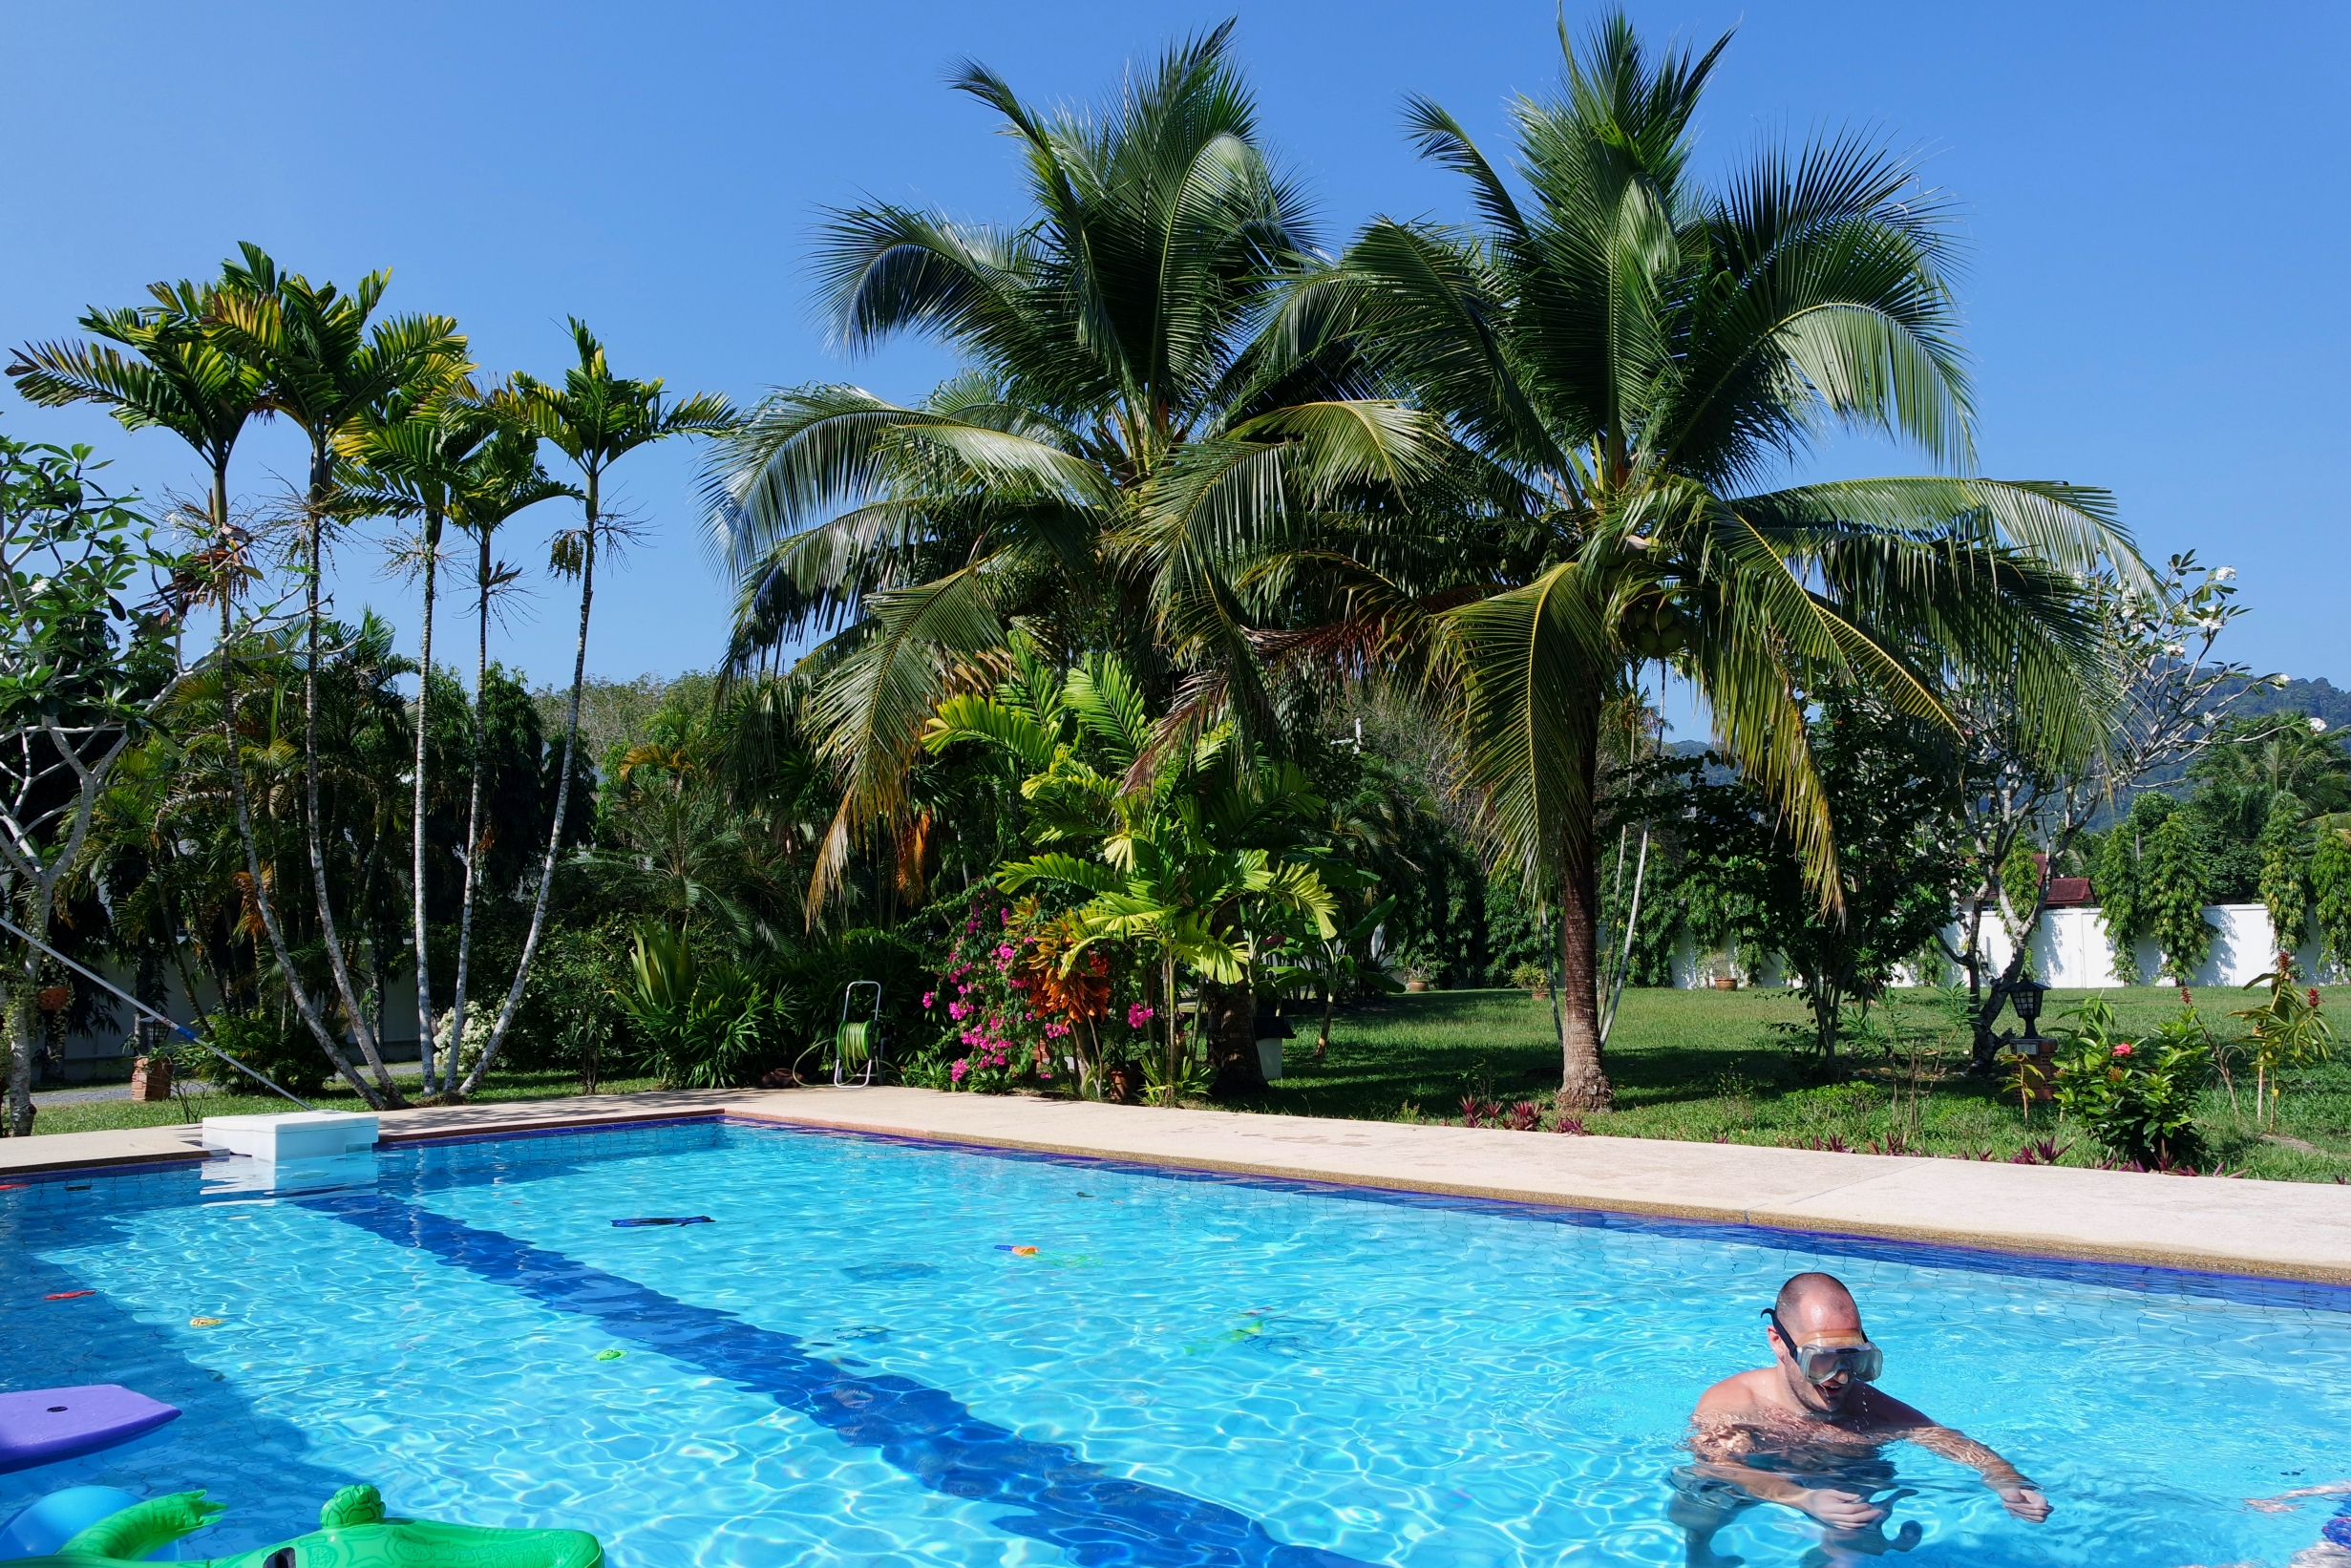 Paklok villa phuket slingerland in thailand - Zwembad omgeving ...